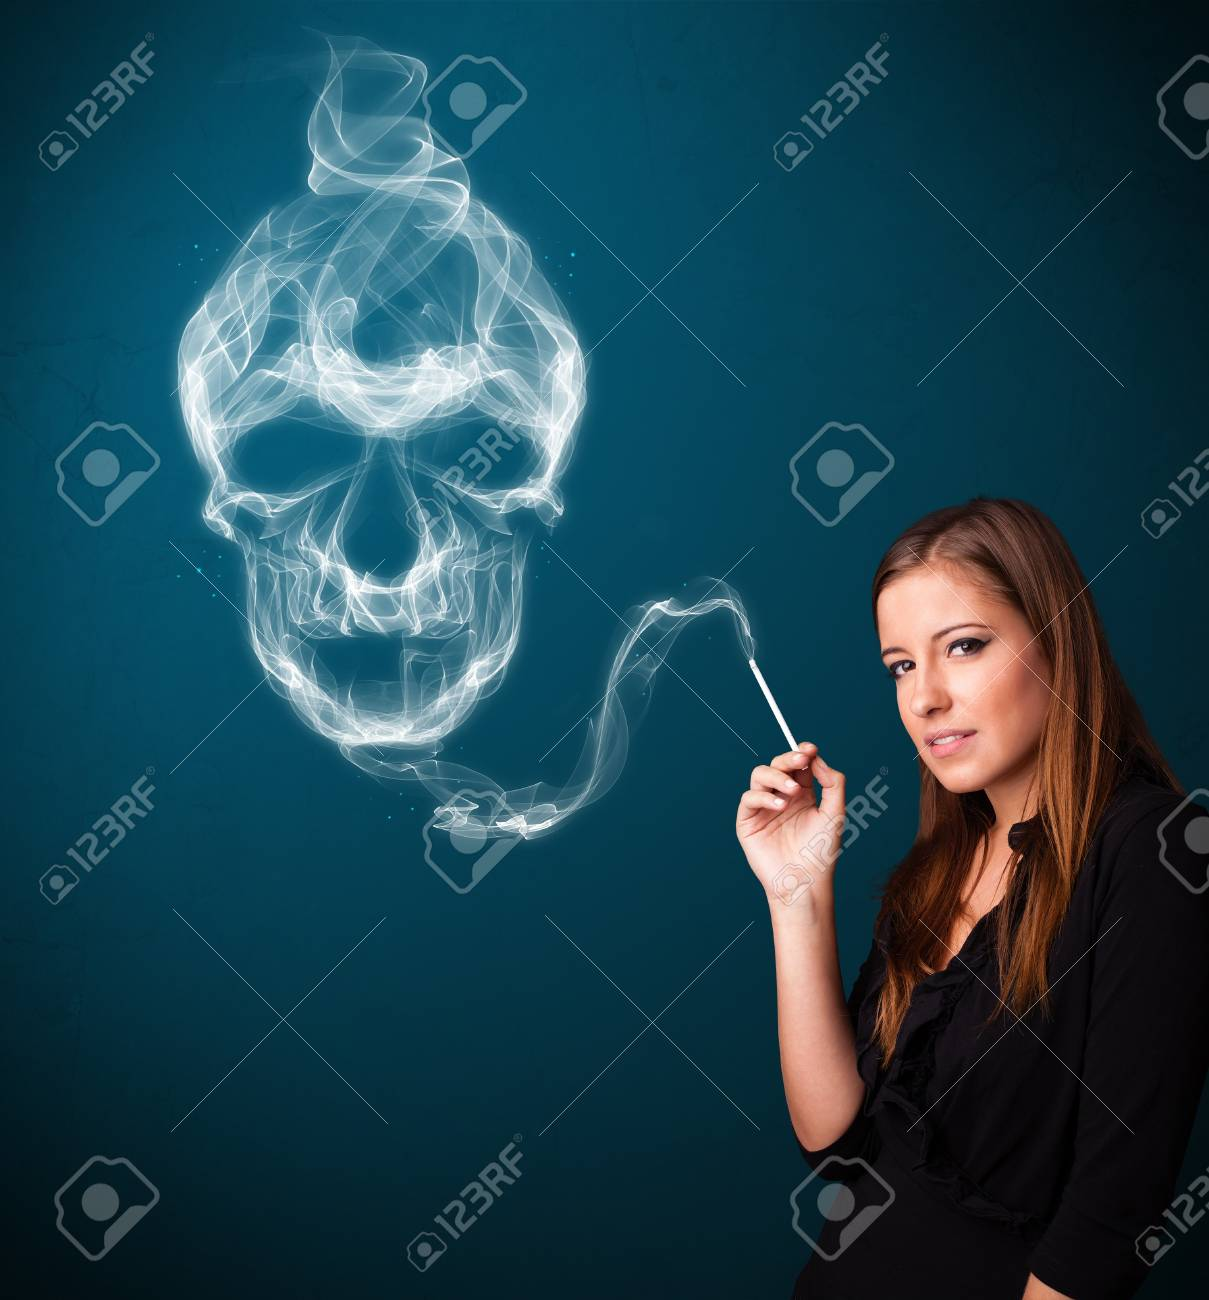 Pretty young woman smoking dangerous cigarette with toxic skull smoke Stock Photo - 16747001